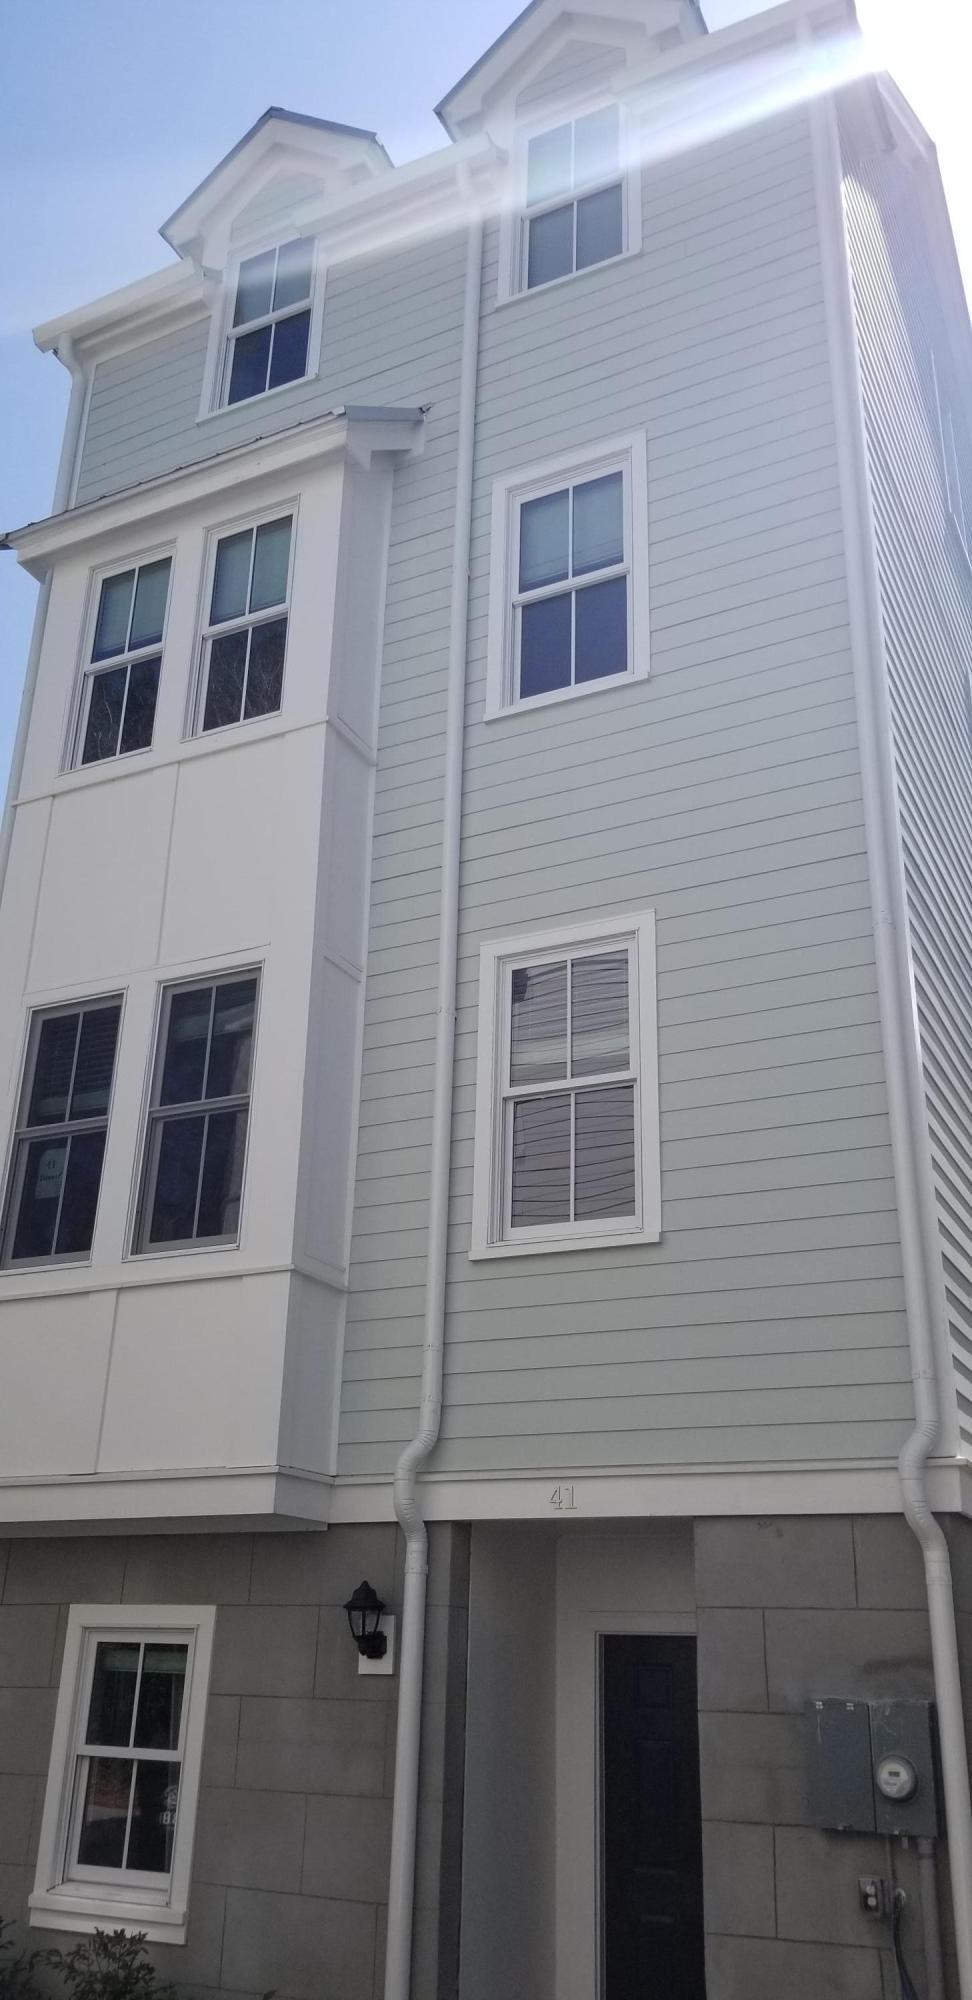 Morris Square Homes For Sale - 41 Dereef, Charleston, SC - 18